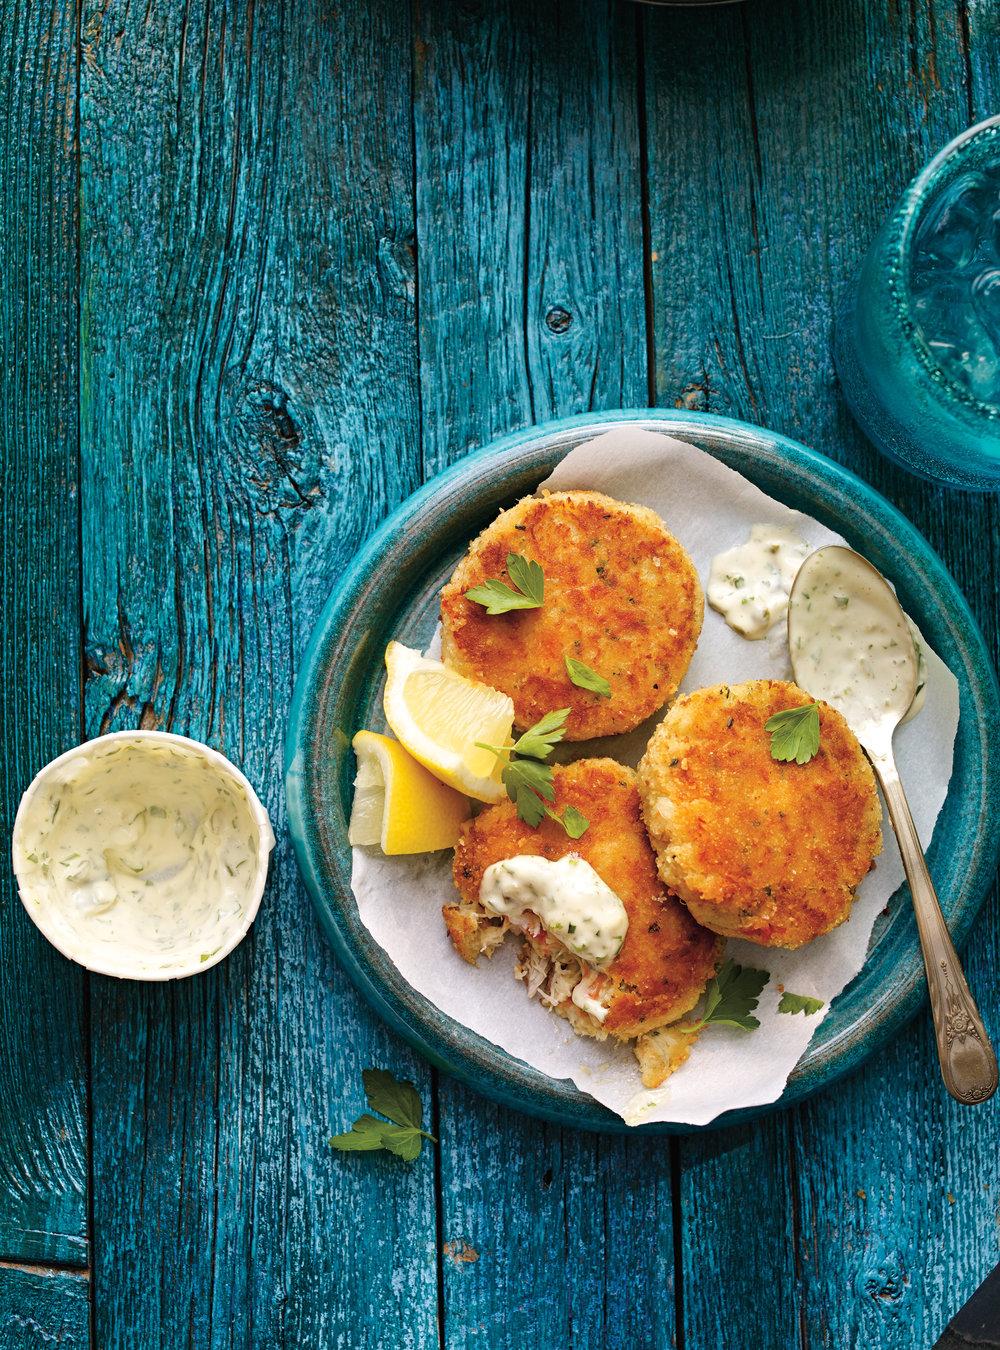 Crab cakes les meilleurs ricardo for Article de cuisine ricardo